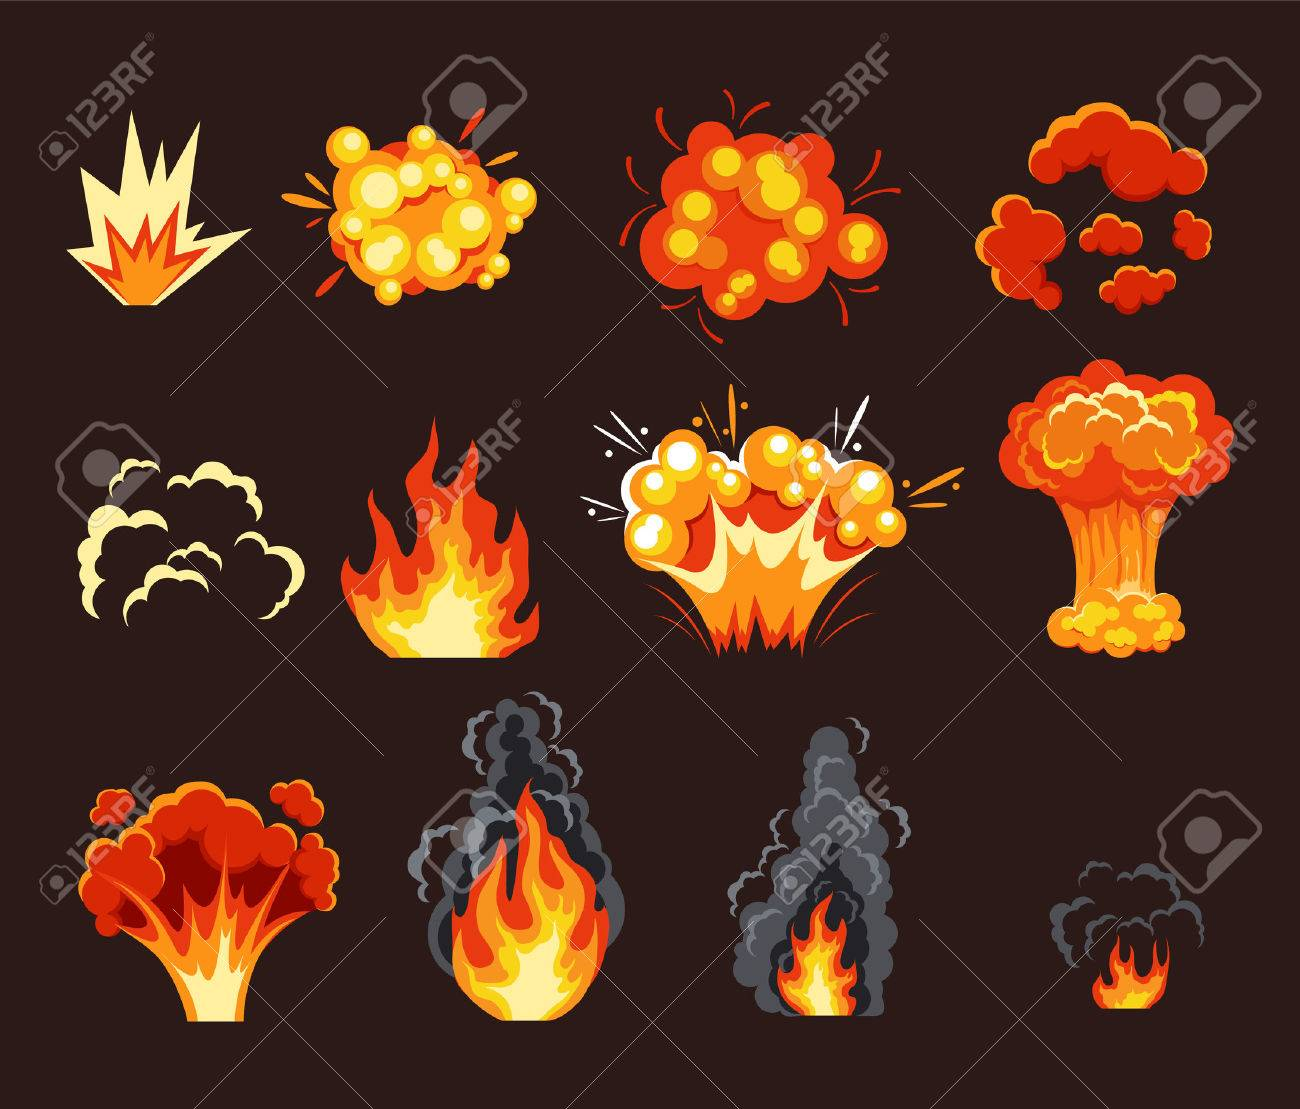 Explosion animation effect. Vector flat cartoon illustration set - 55212048